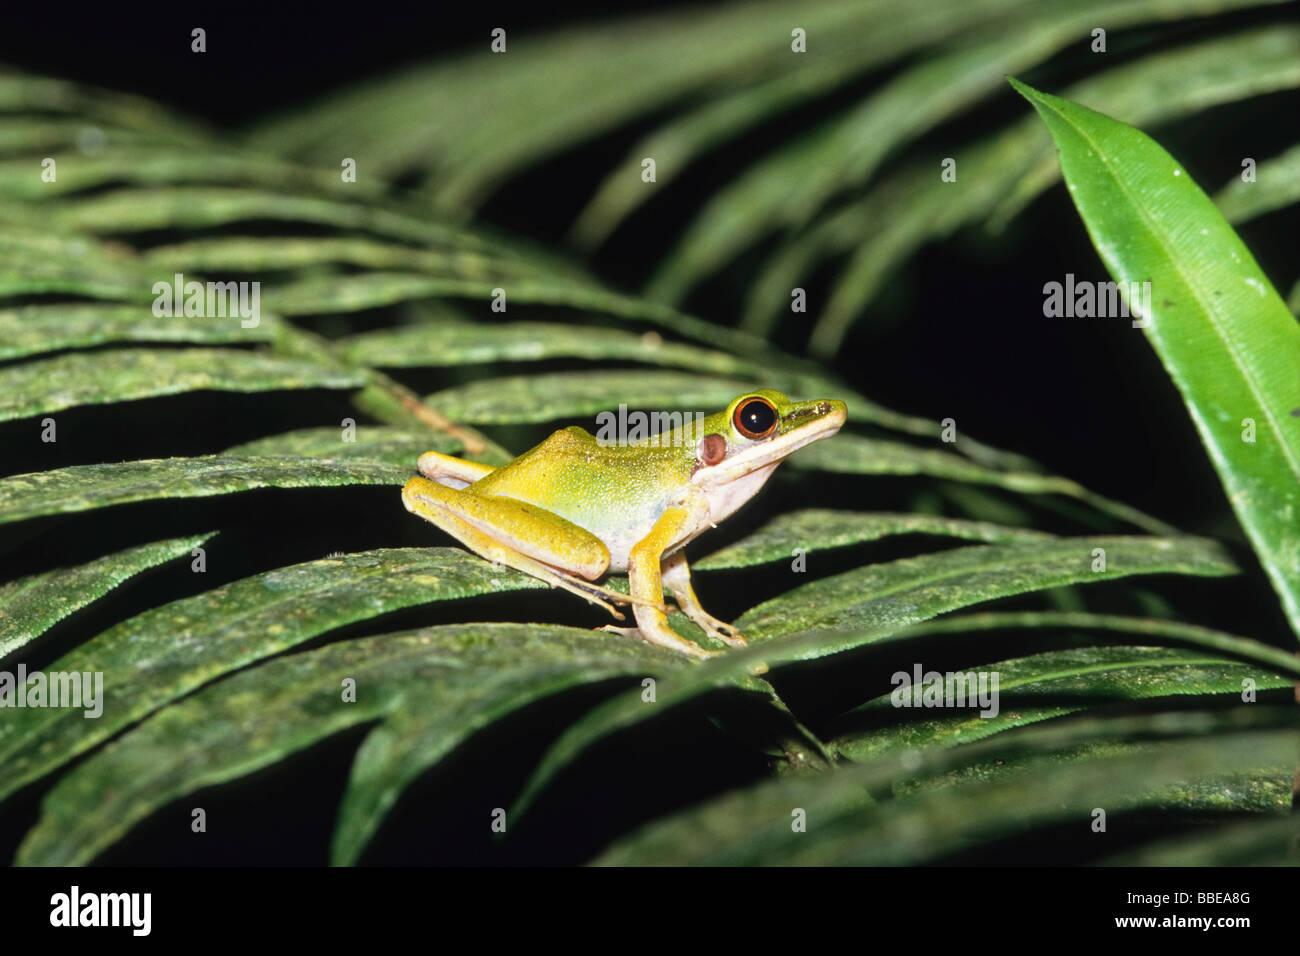 Frog in tropical rainforest, Gunung Leuser National Park, Sumatra, Indonesia, Asia - Stock Image